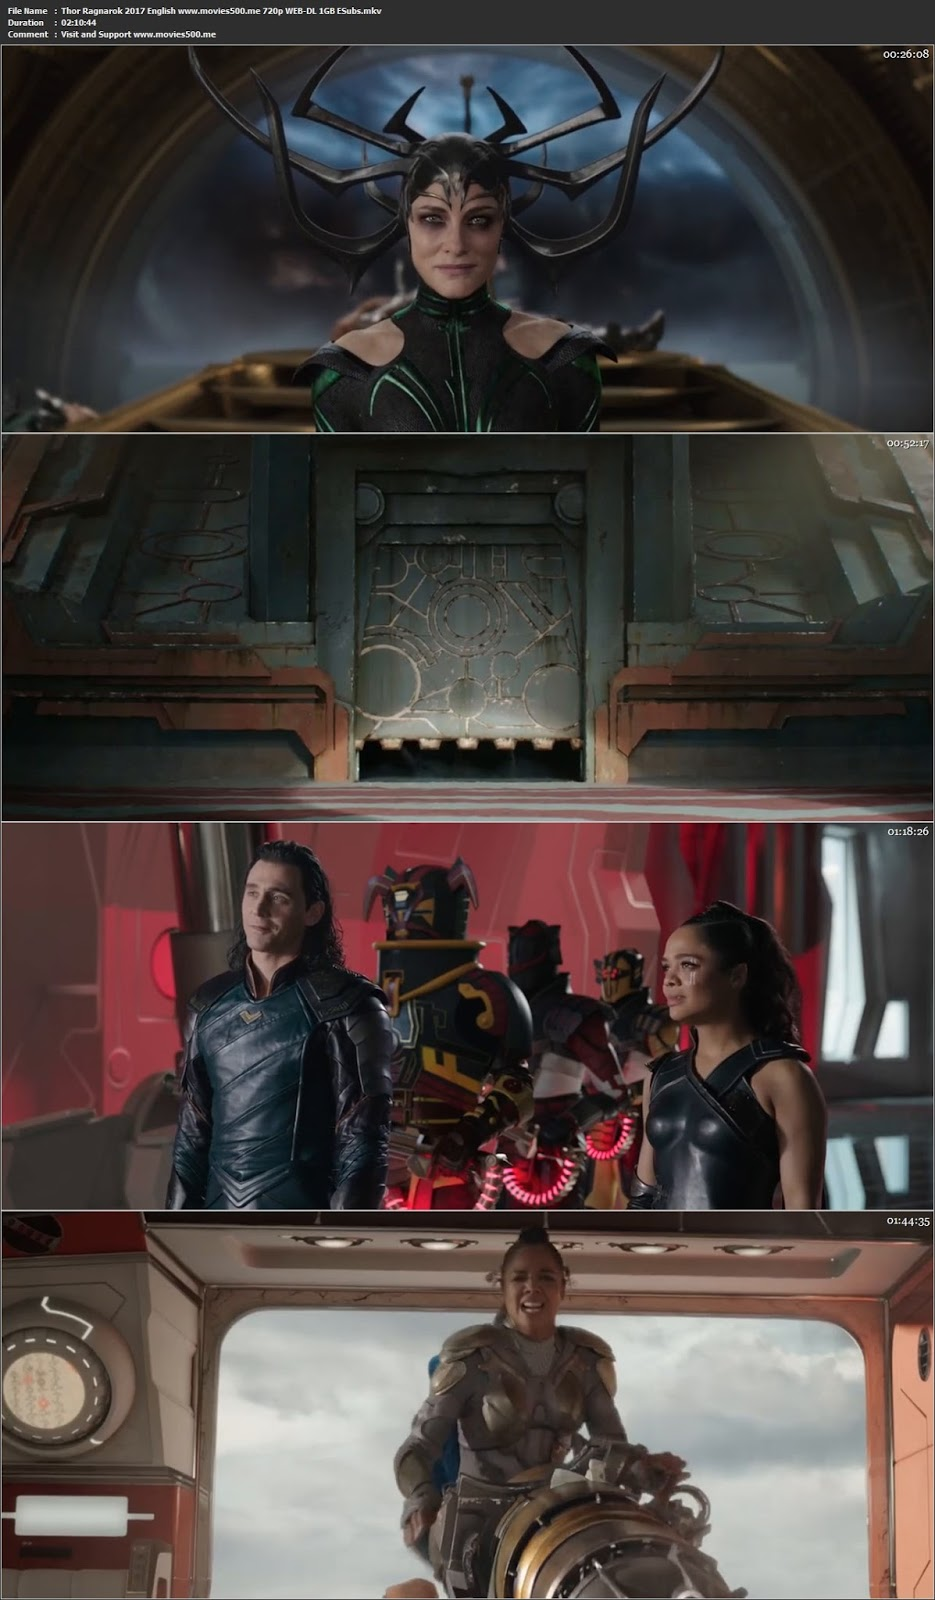 Thor Ragnarok 2017 Dual Audio Hind Movie WEB DL 720p 1GB at createkits.com